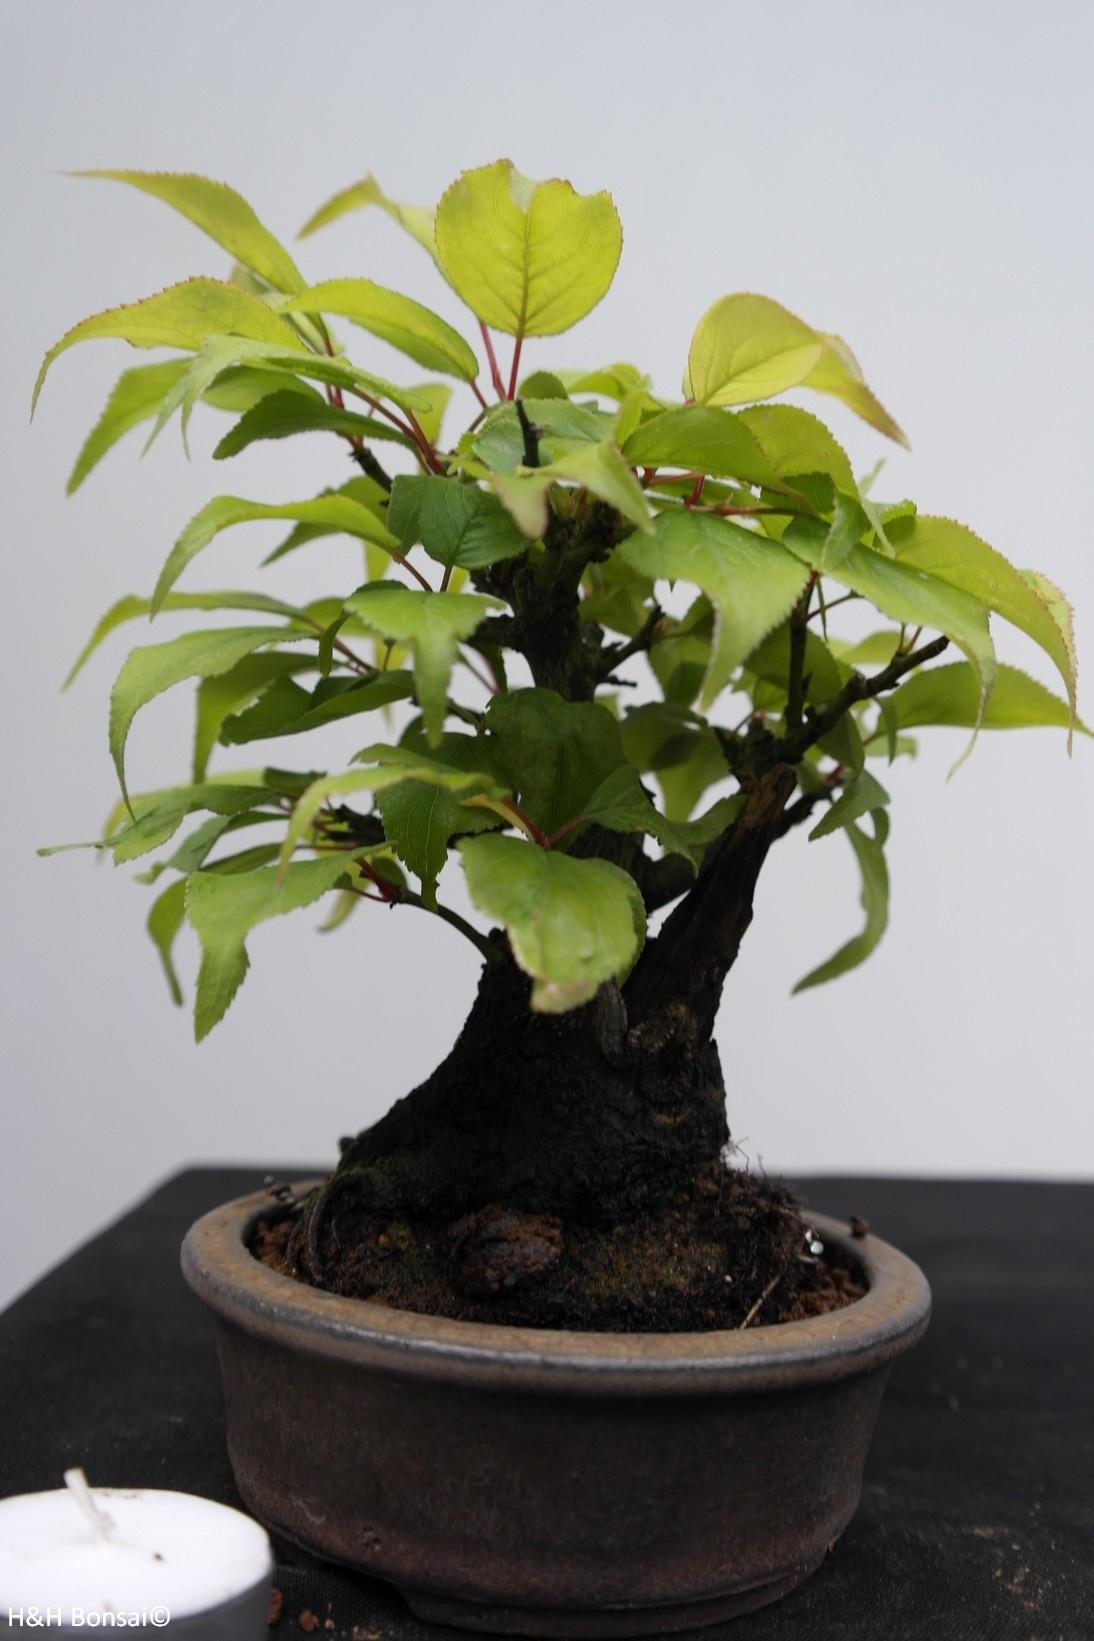 Bonsai Shohin di Albicocco giapponese, Prunus mume, no. 7780